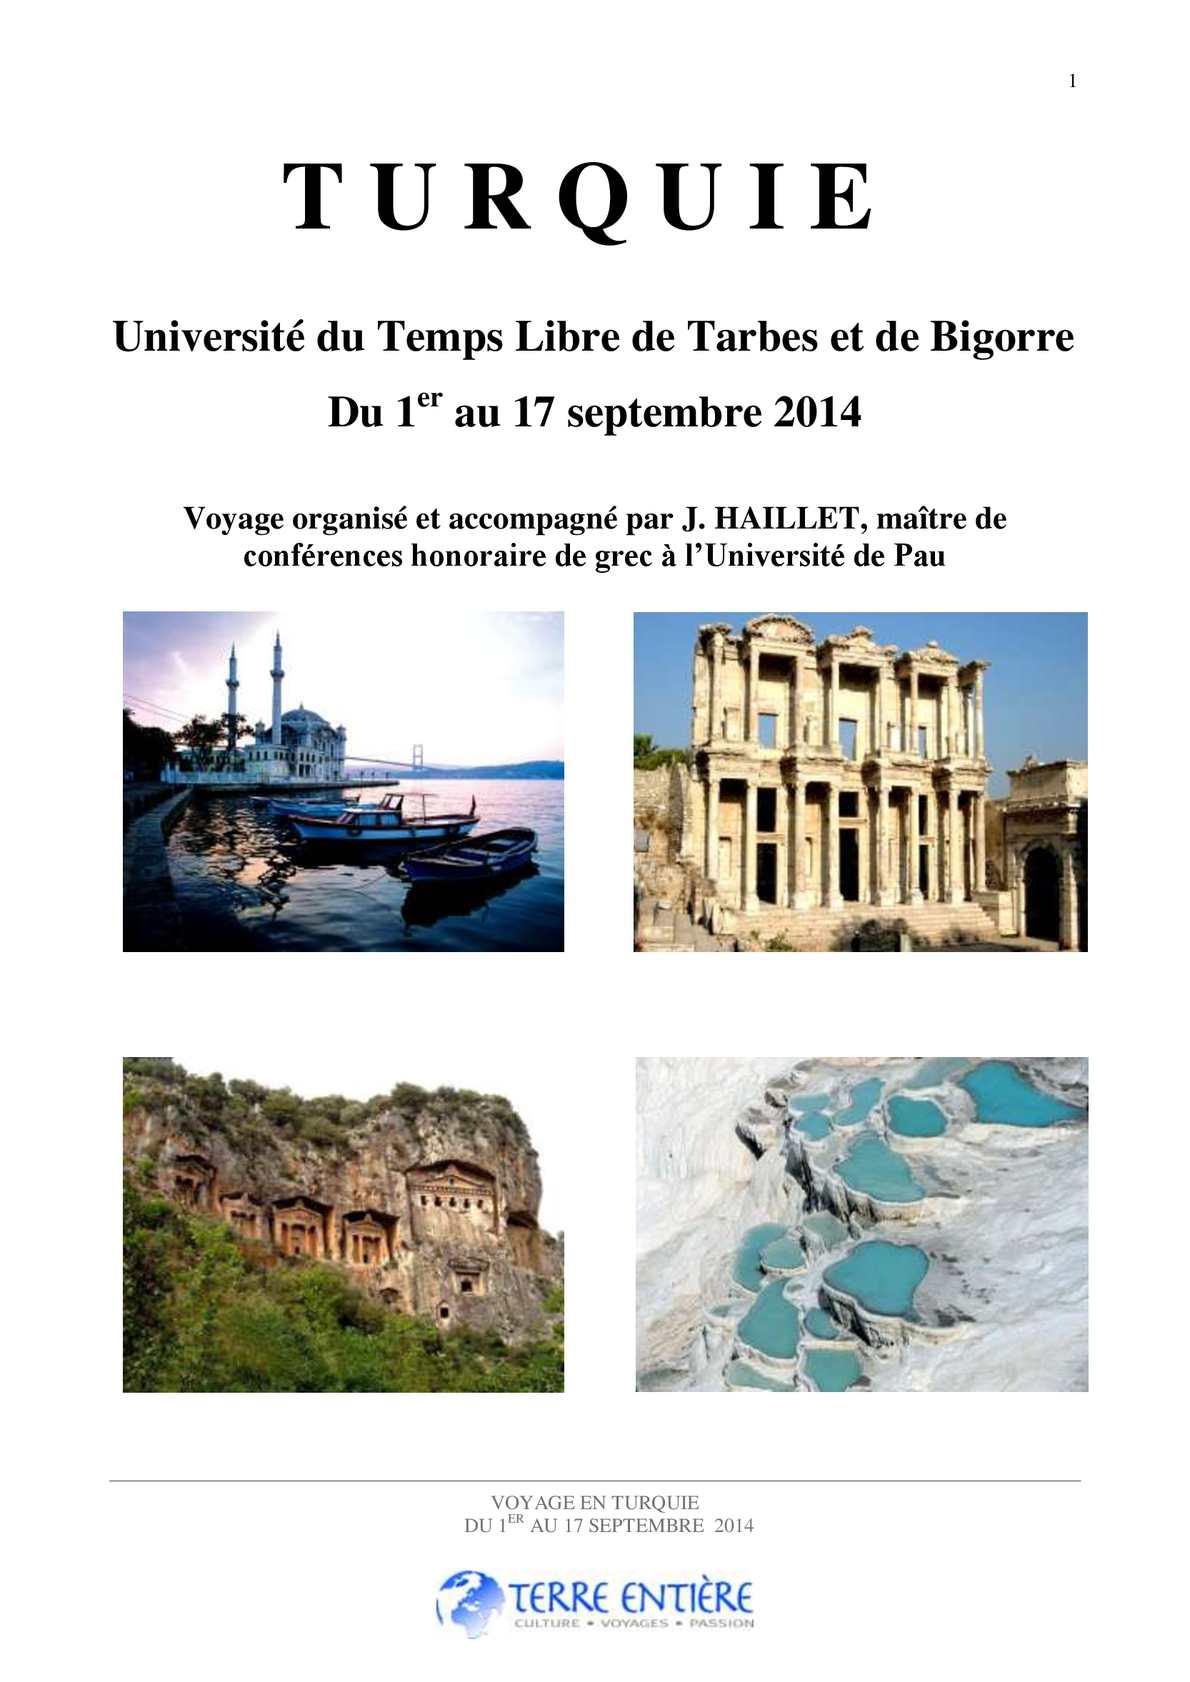 programme voyage organisé turquie